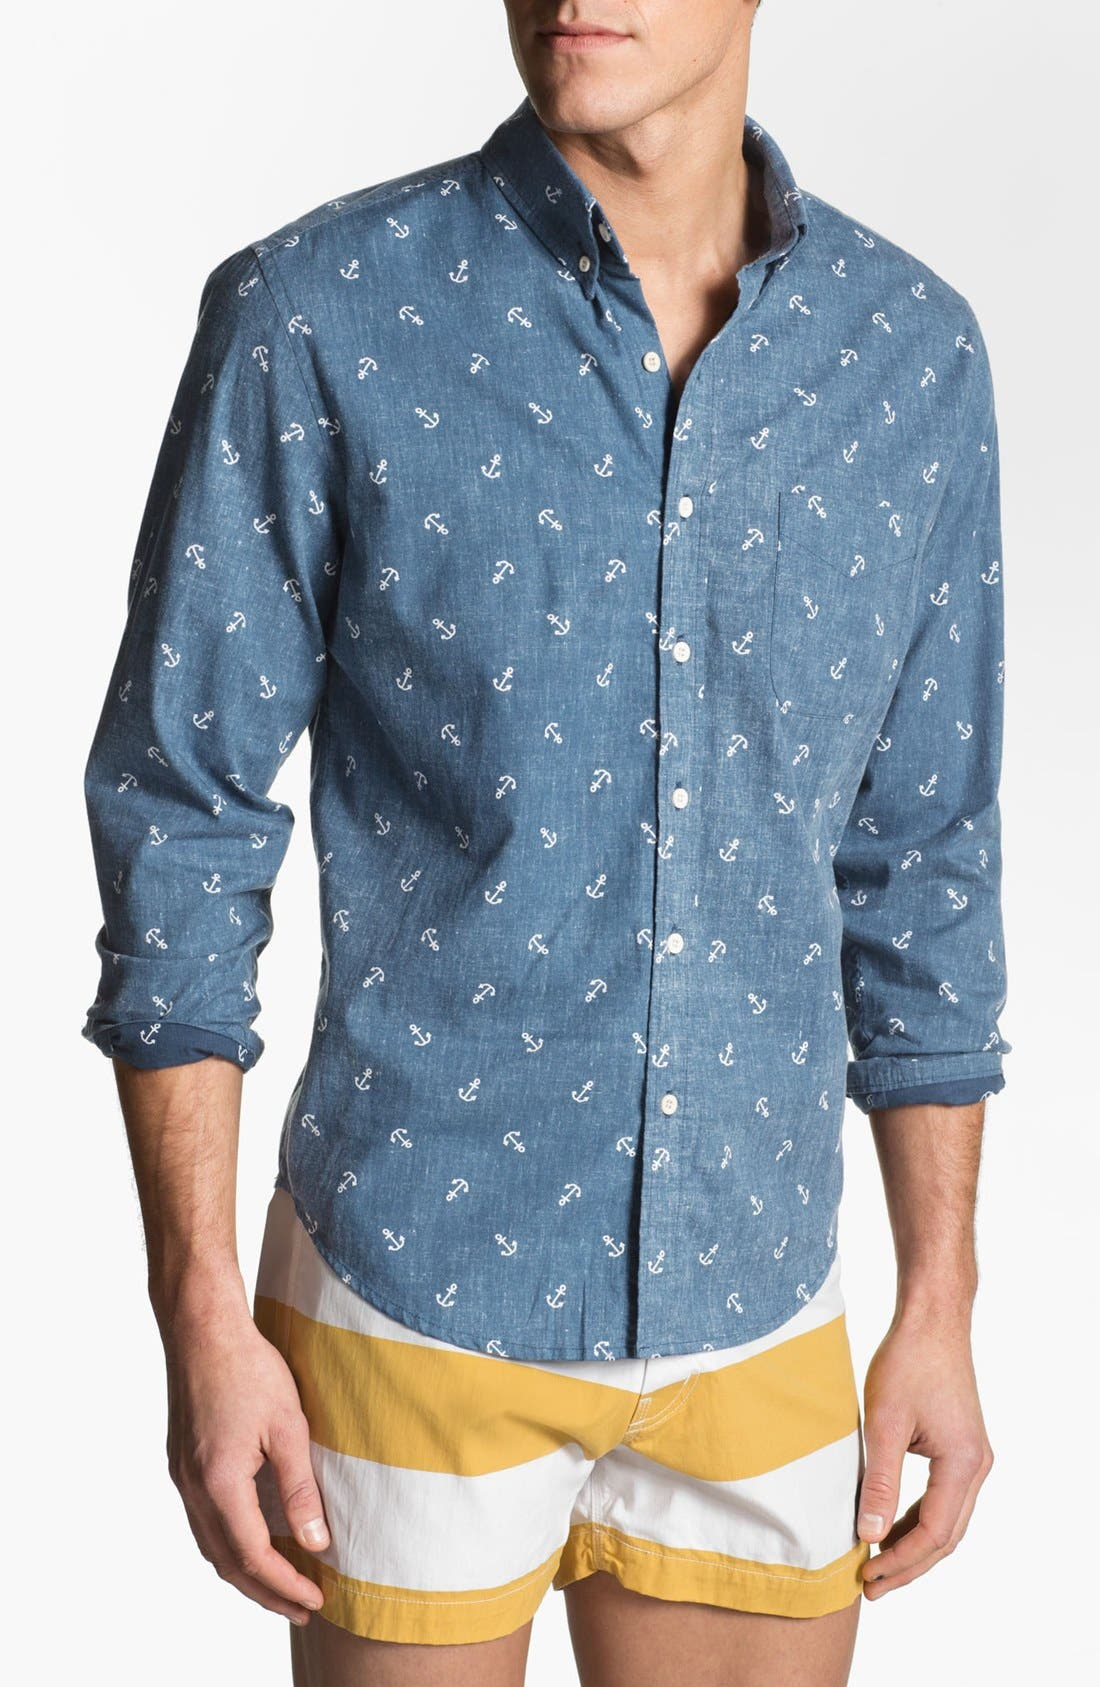 Main Image - Altru 'Anchors' Print Woven Shirt